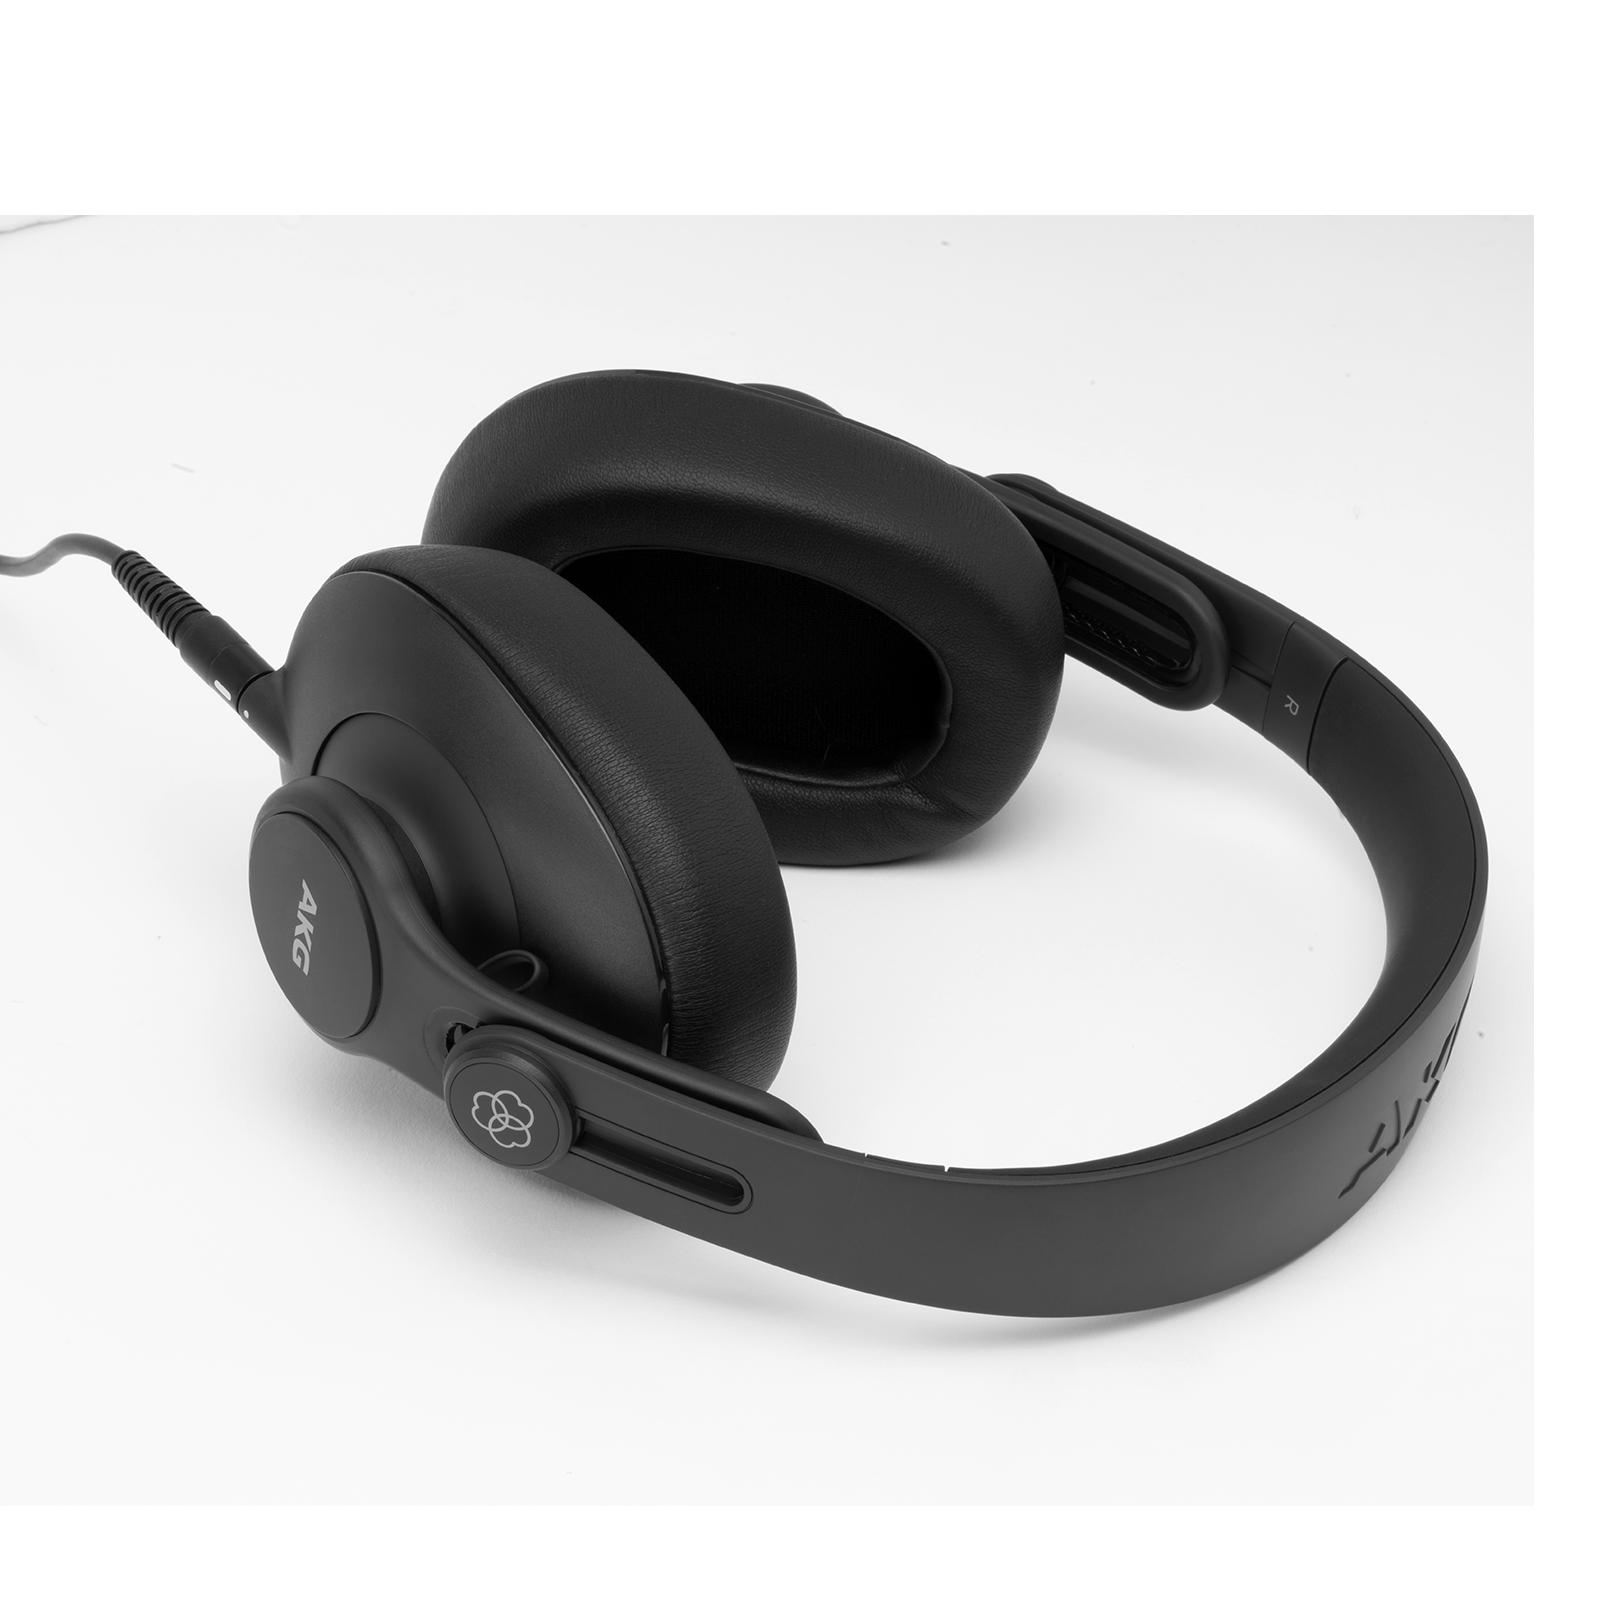 K361 - Black - Over-ear, closed-back, foldable studio headphones  - Detailshot 3